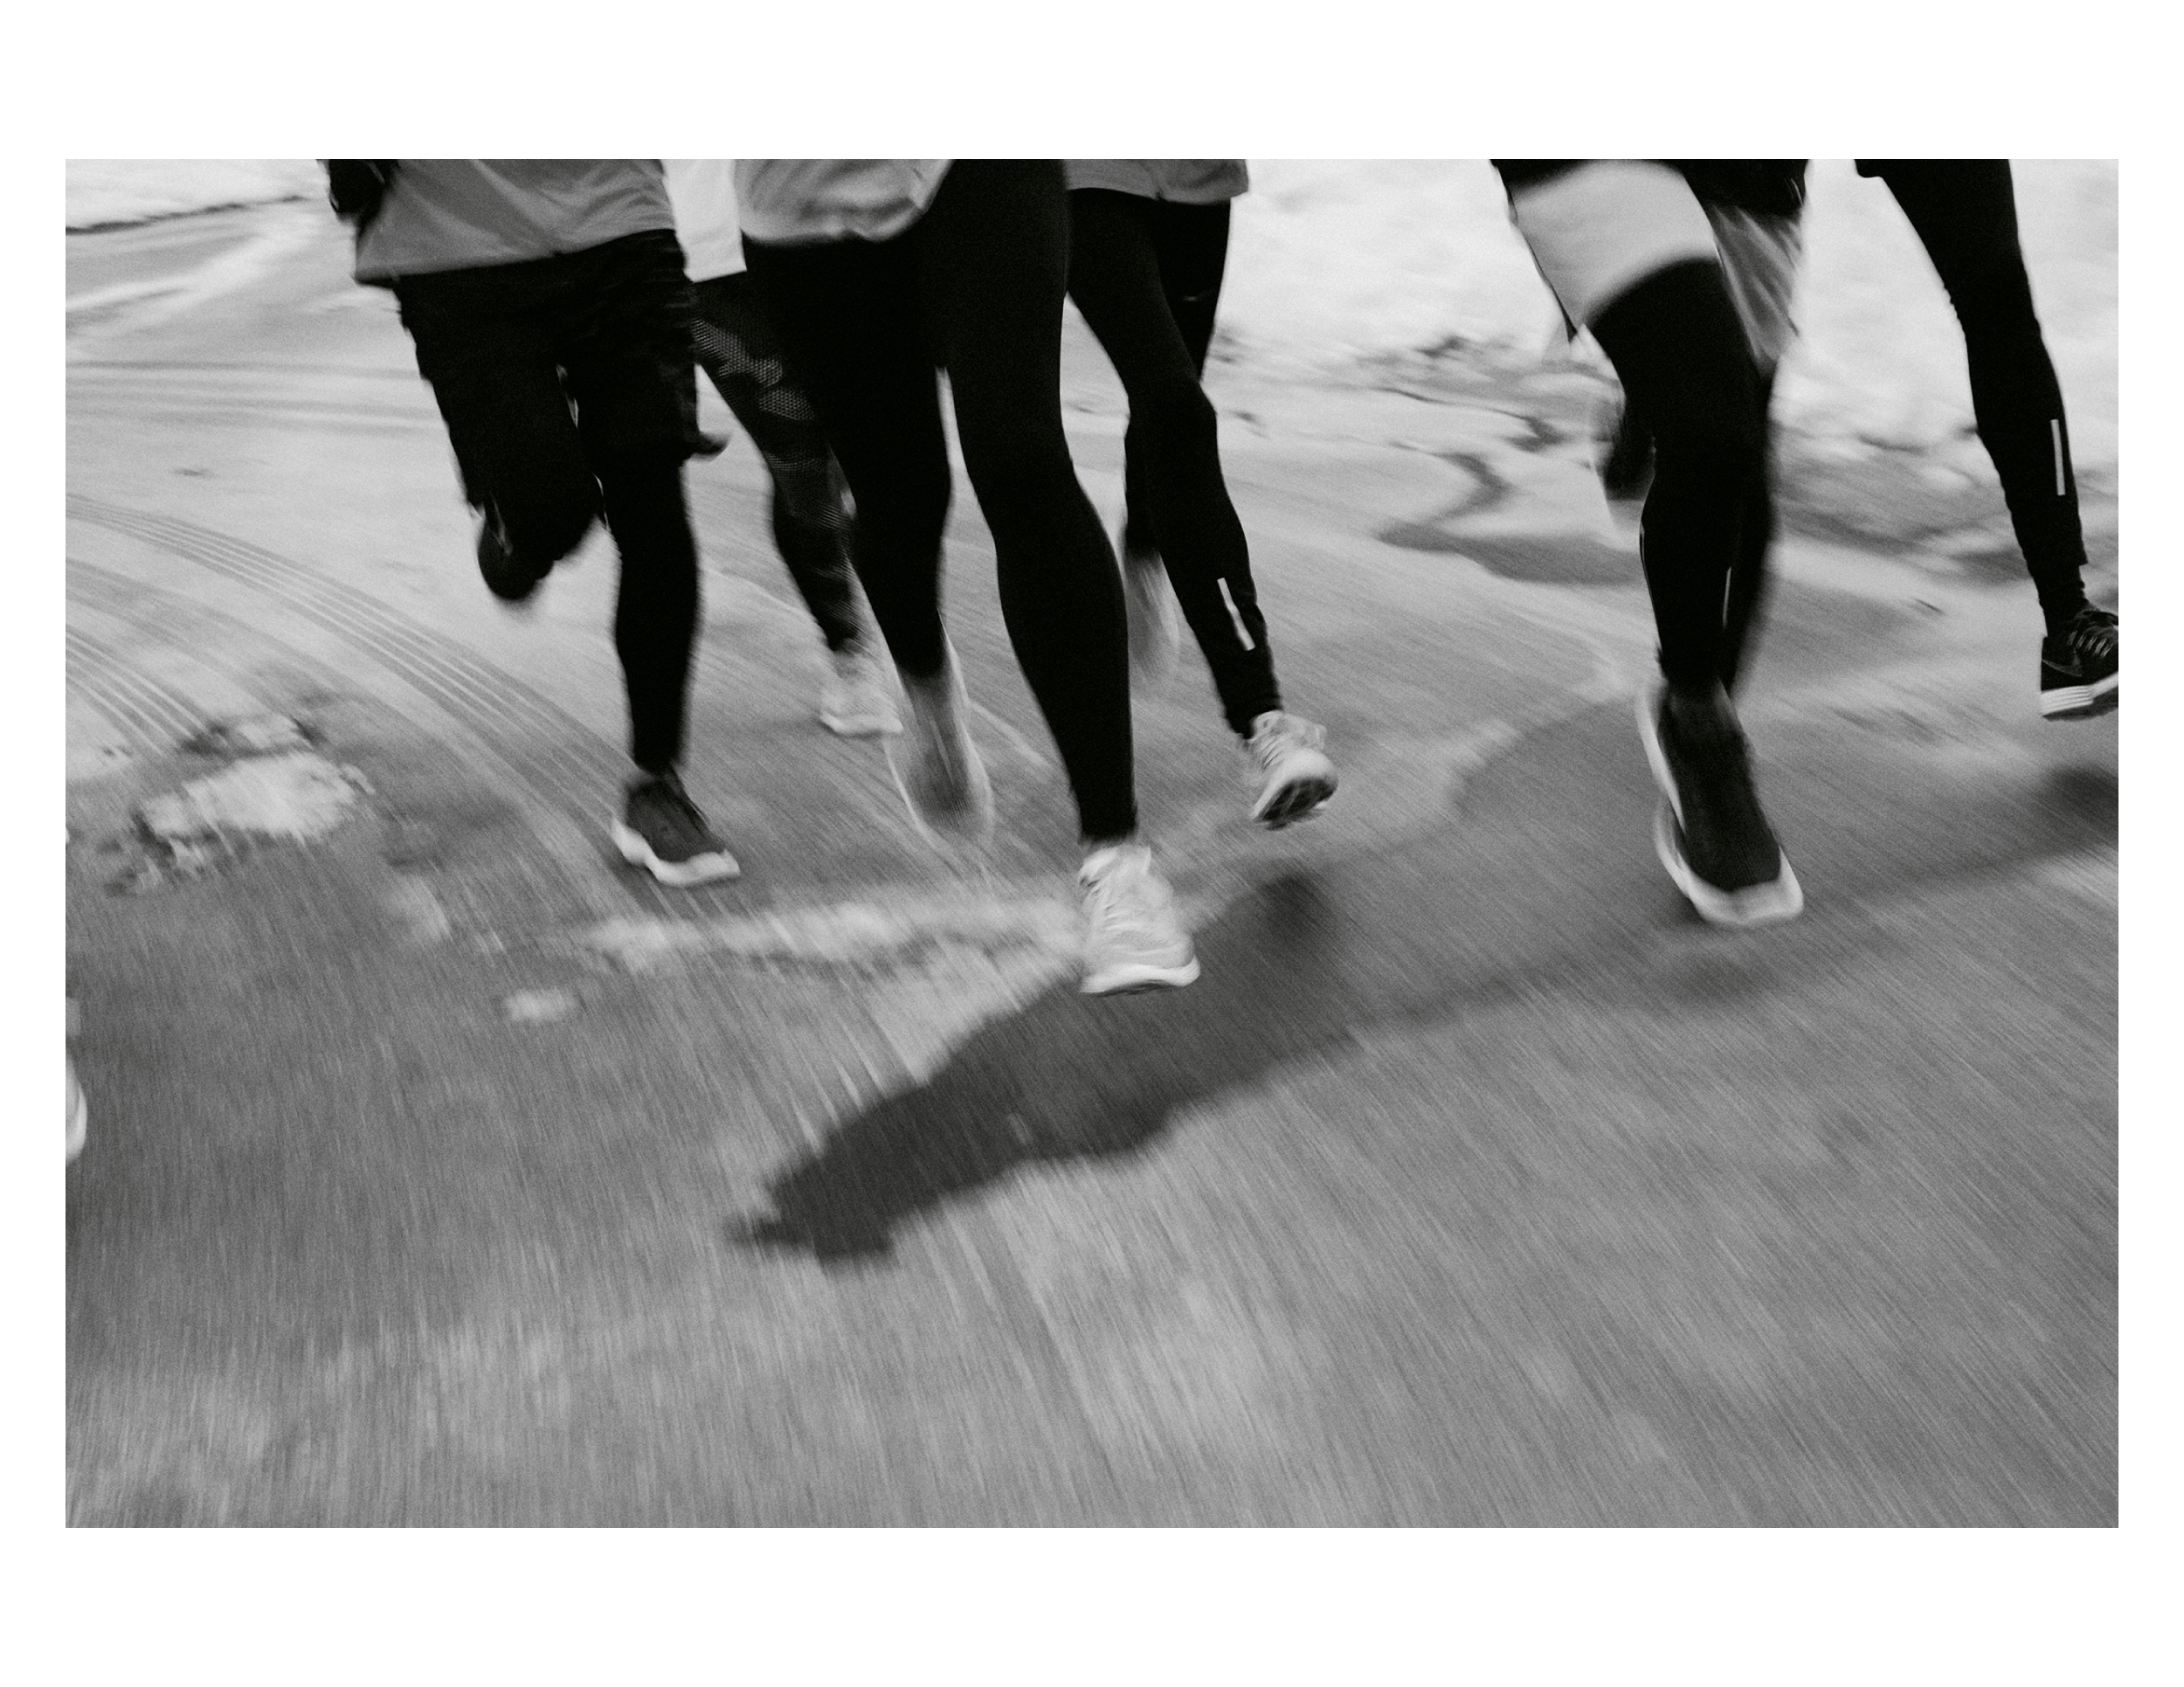 NikeLunarTempo_Slide7.jpg